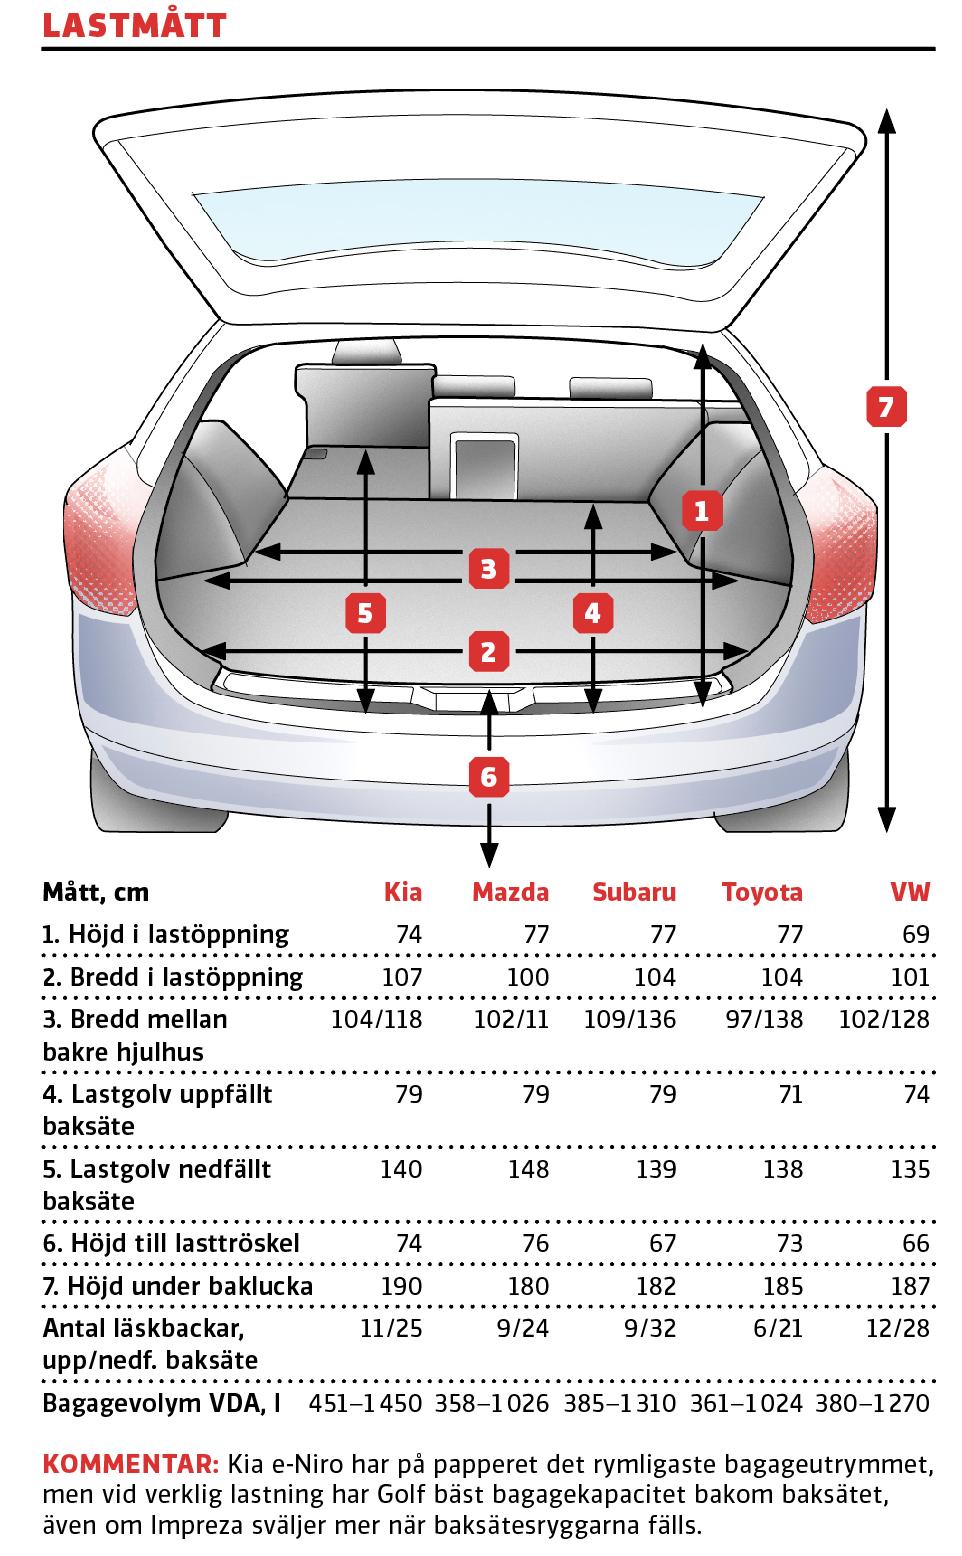 Testvärden: Kia e-Niro, Mazda 3, Subaru Impreza, Toyota Corolla, Volkswagen Golf (2019)